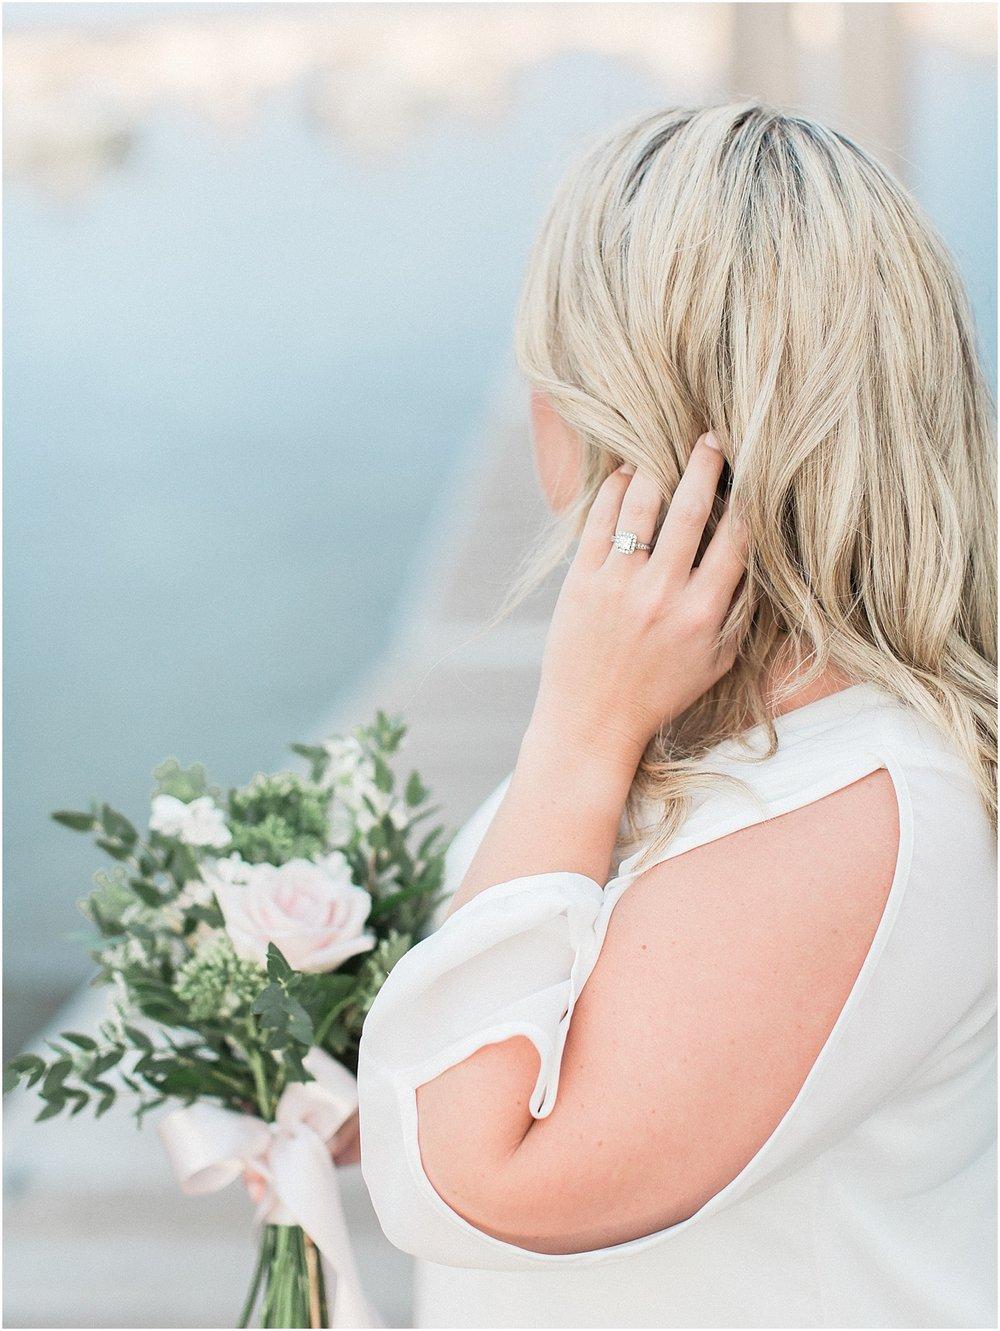 amy_erik_plymouth_brewster_gardens_jetty_champagne_cape_cod_boston_wedding_photographer_meredith_jane_photography_photo_0776.jpg